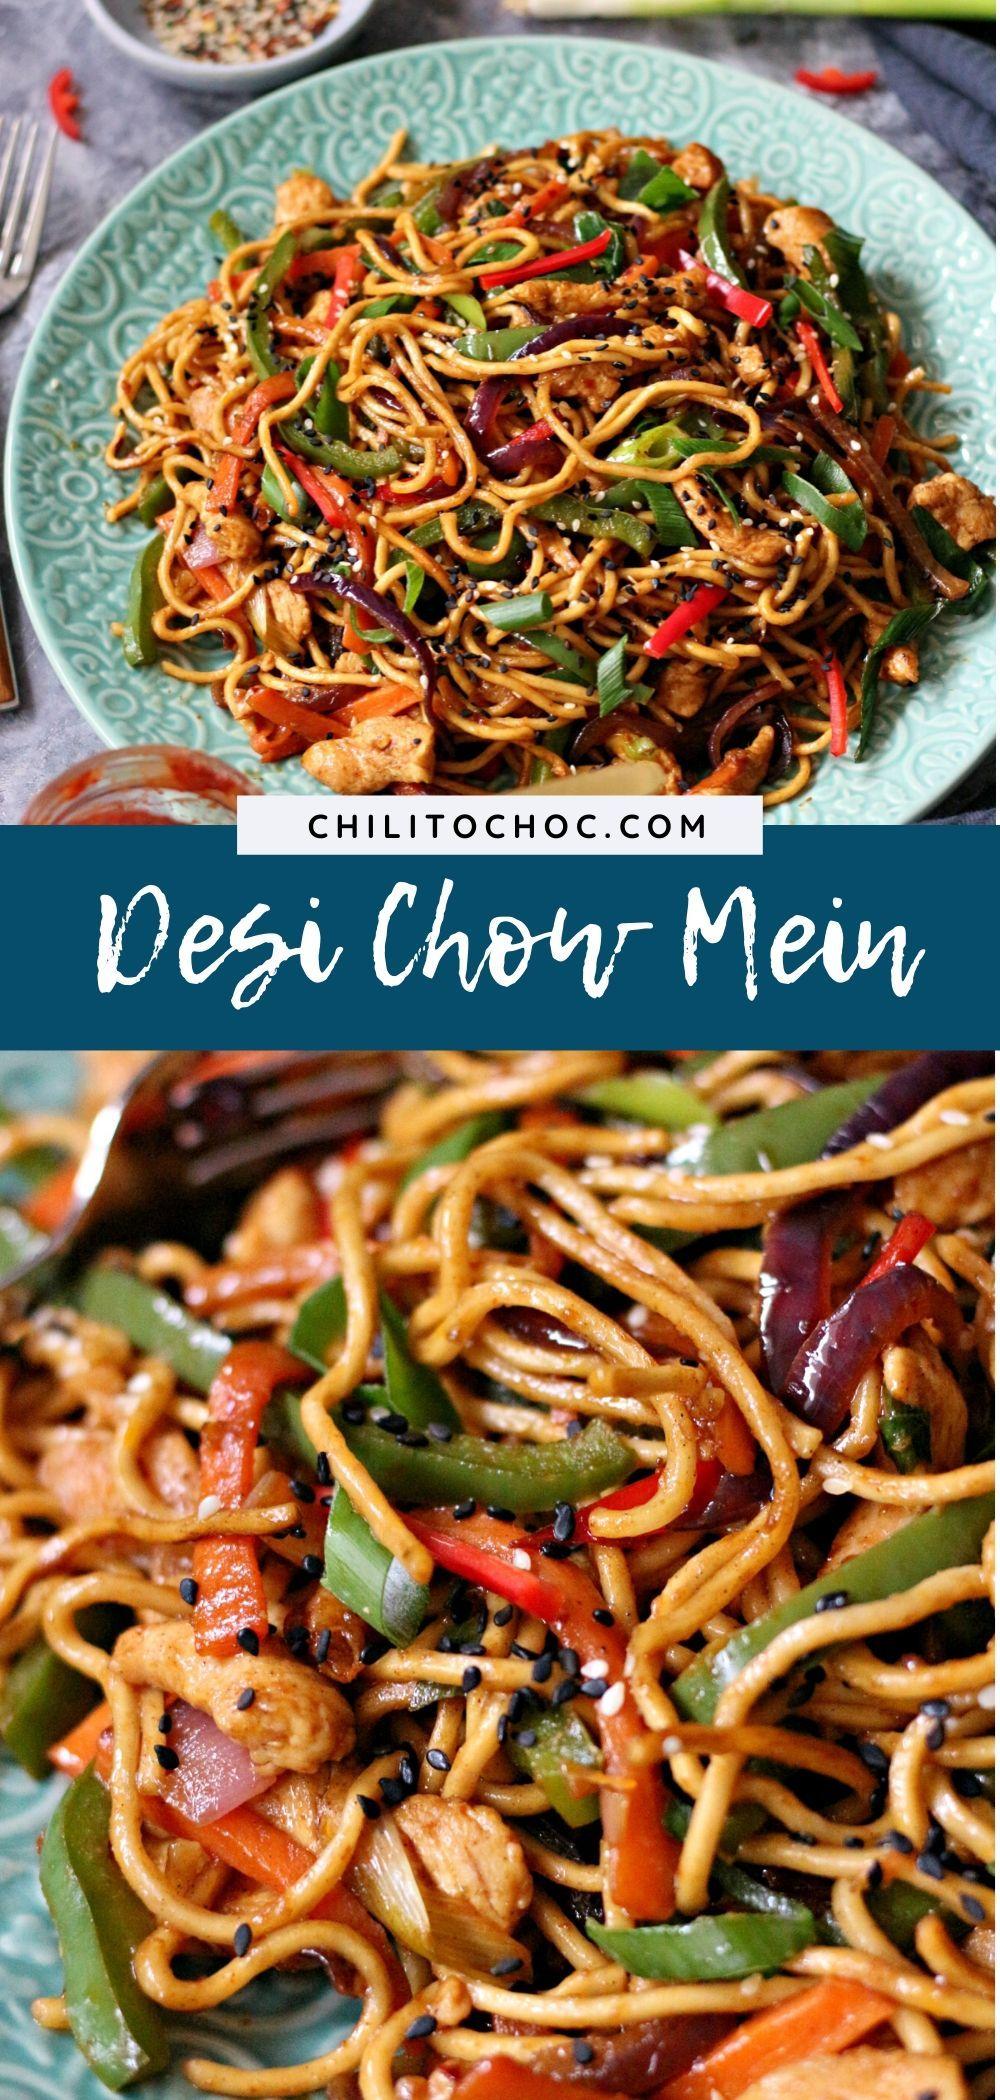 Desi Chow Mein In 2020 Chow Mein Chow Mein Recipe Desi Food